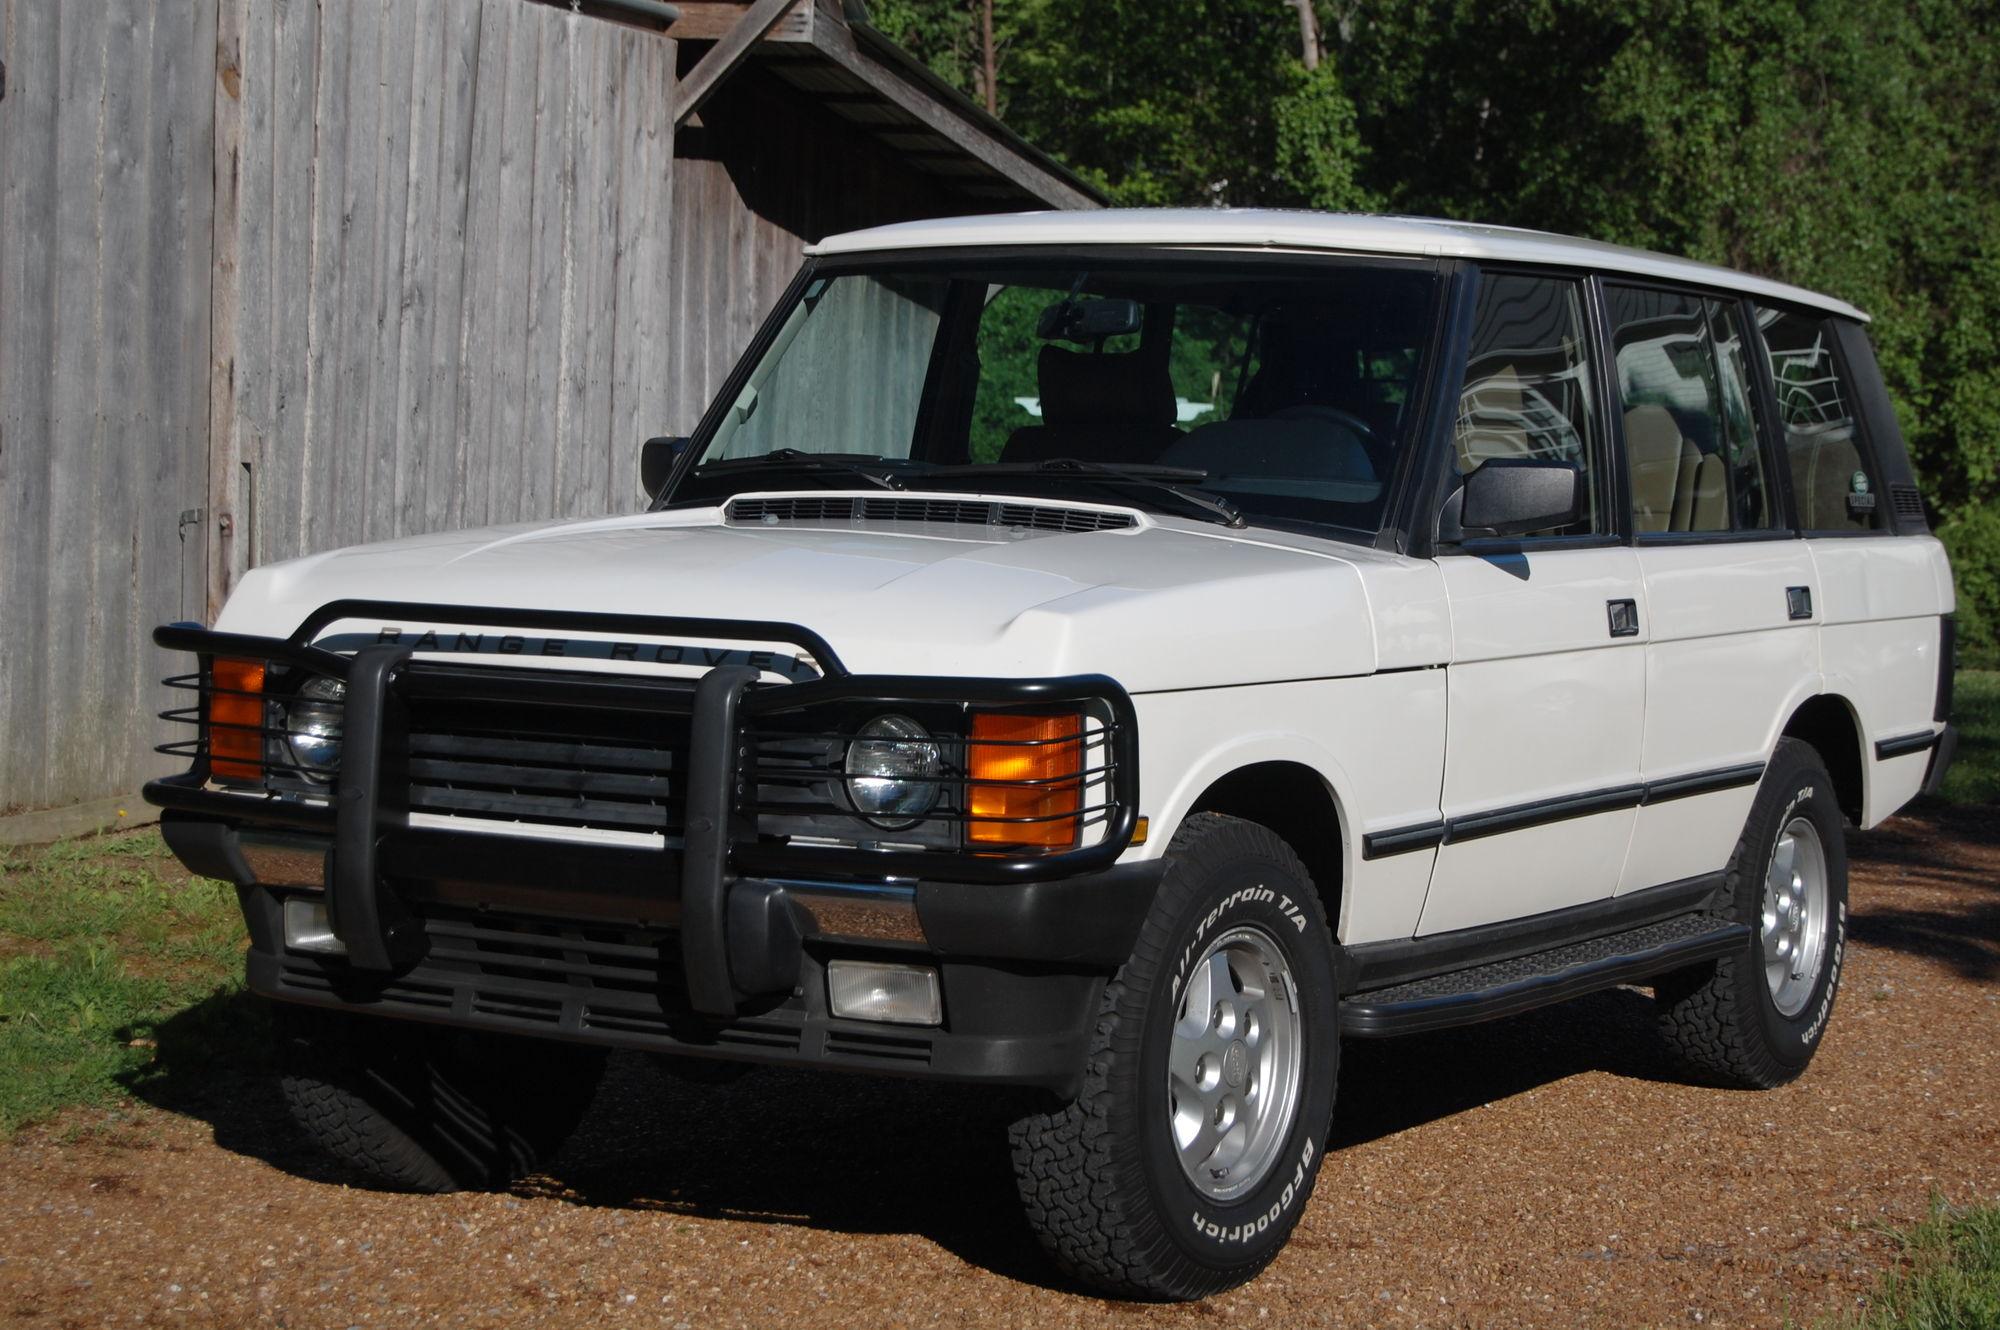 FS 1995 Range Rover Classic County LWB no rust CA GA truck